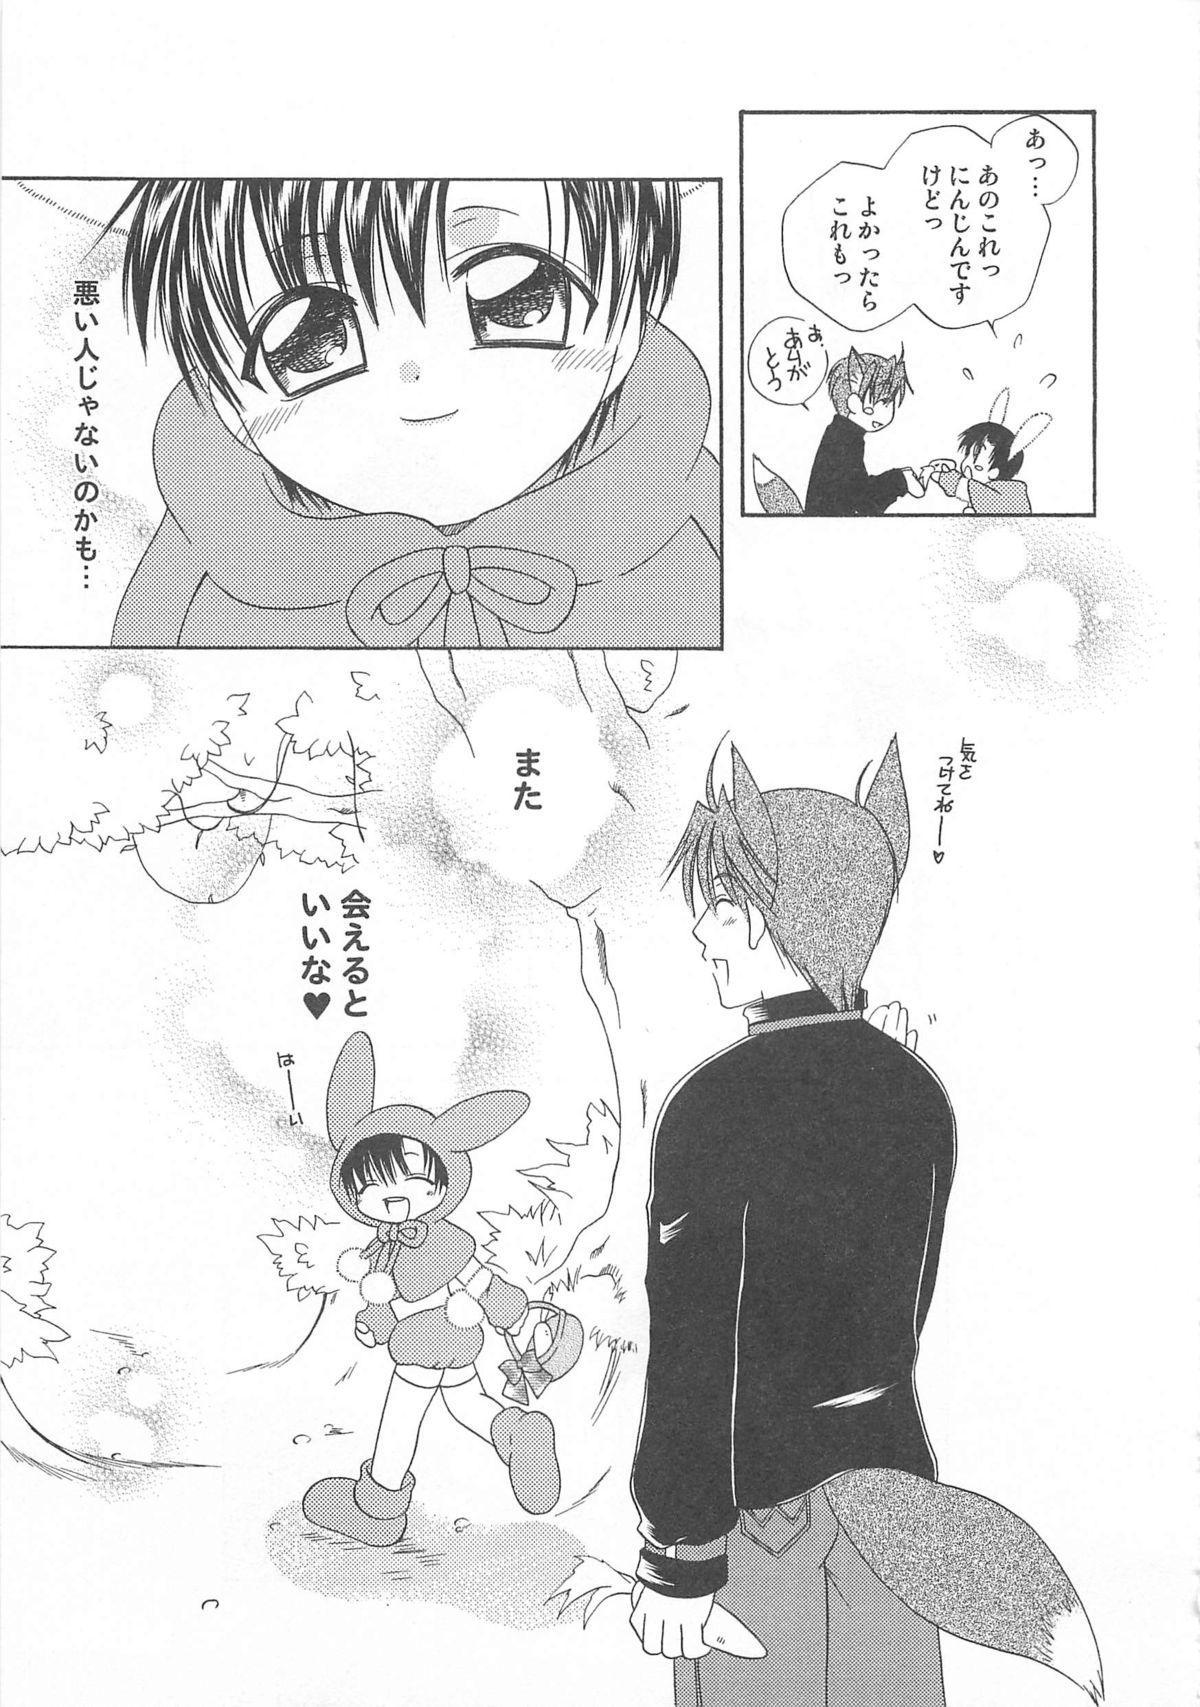 Otokonoko HEAVEN Vol. 02 Dokidoki Chikan Taiken 163